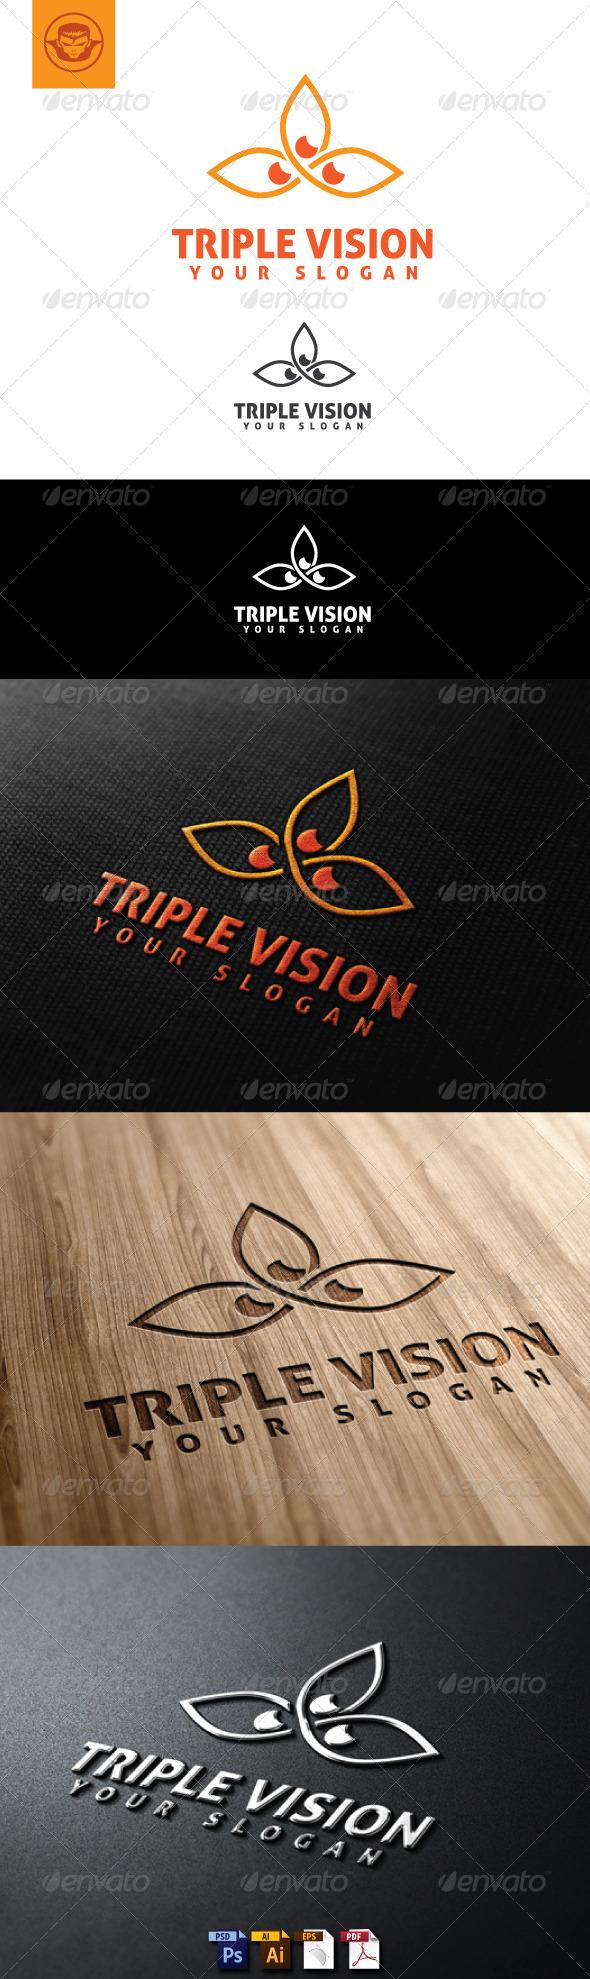 GraphicRiver Triple Vision Logo Template 4948440